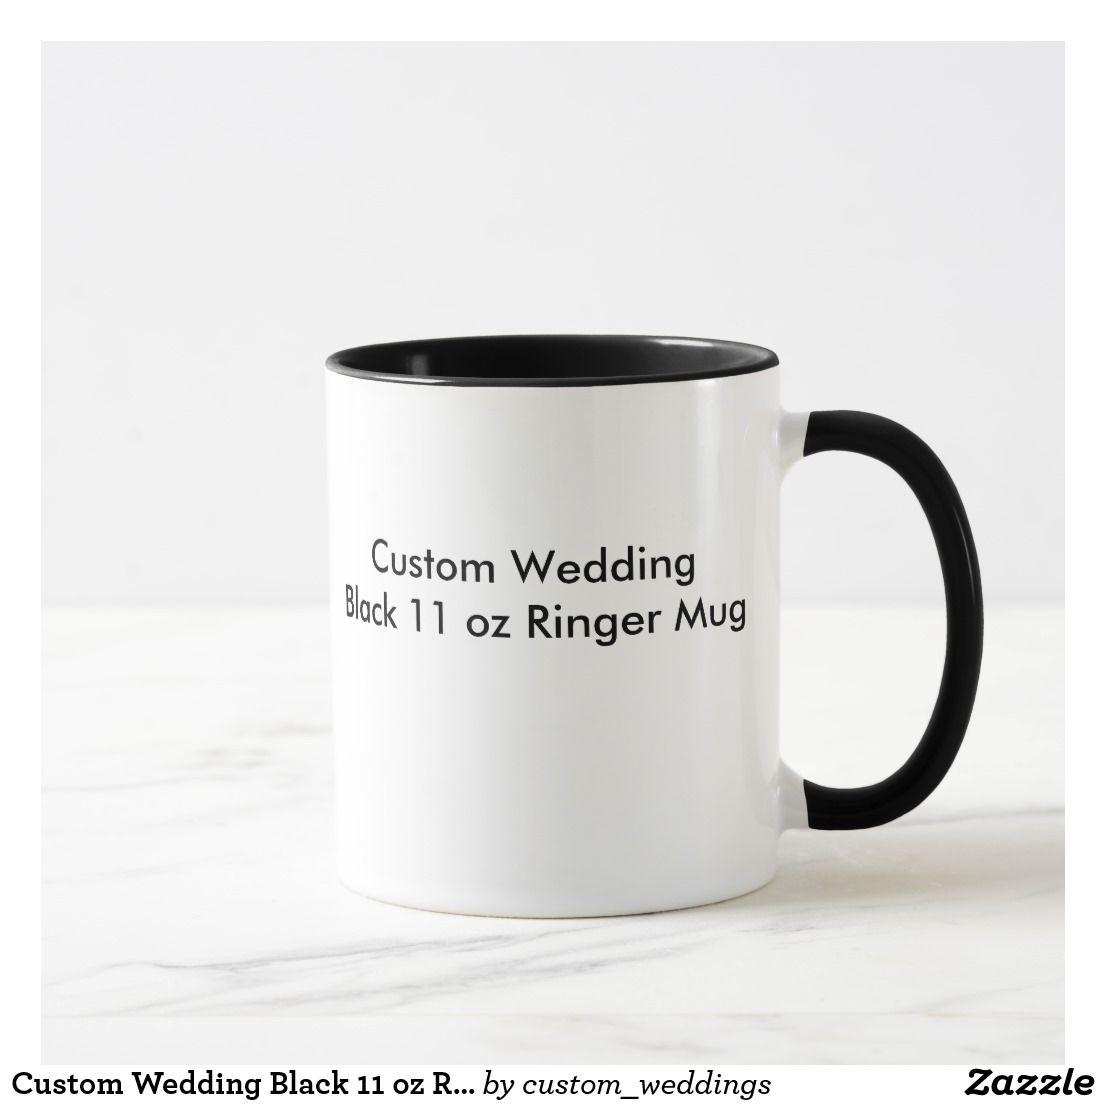 Custom Wedding Black 11 oz Ringer Mug | Wedding black, Wedding and Black